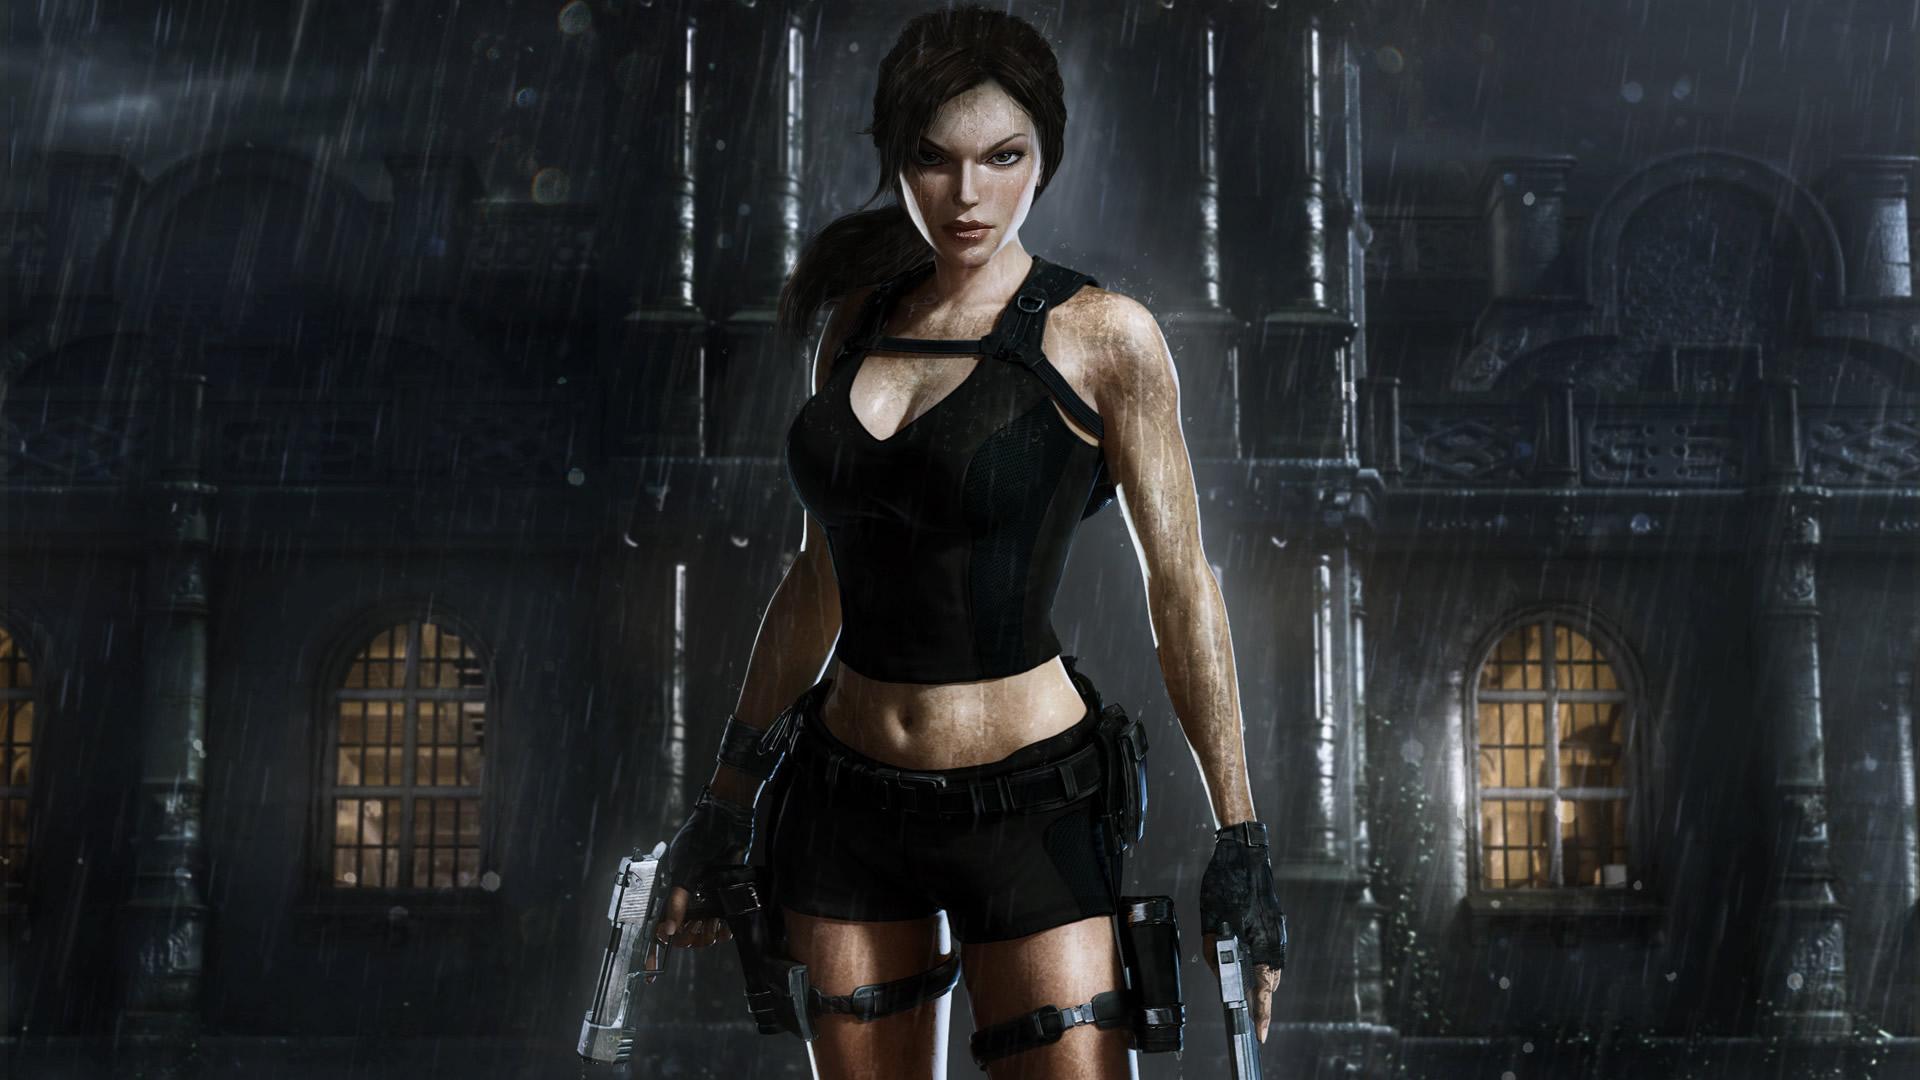 Lara croft underworld naked sluts